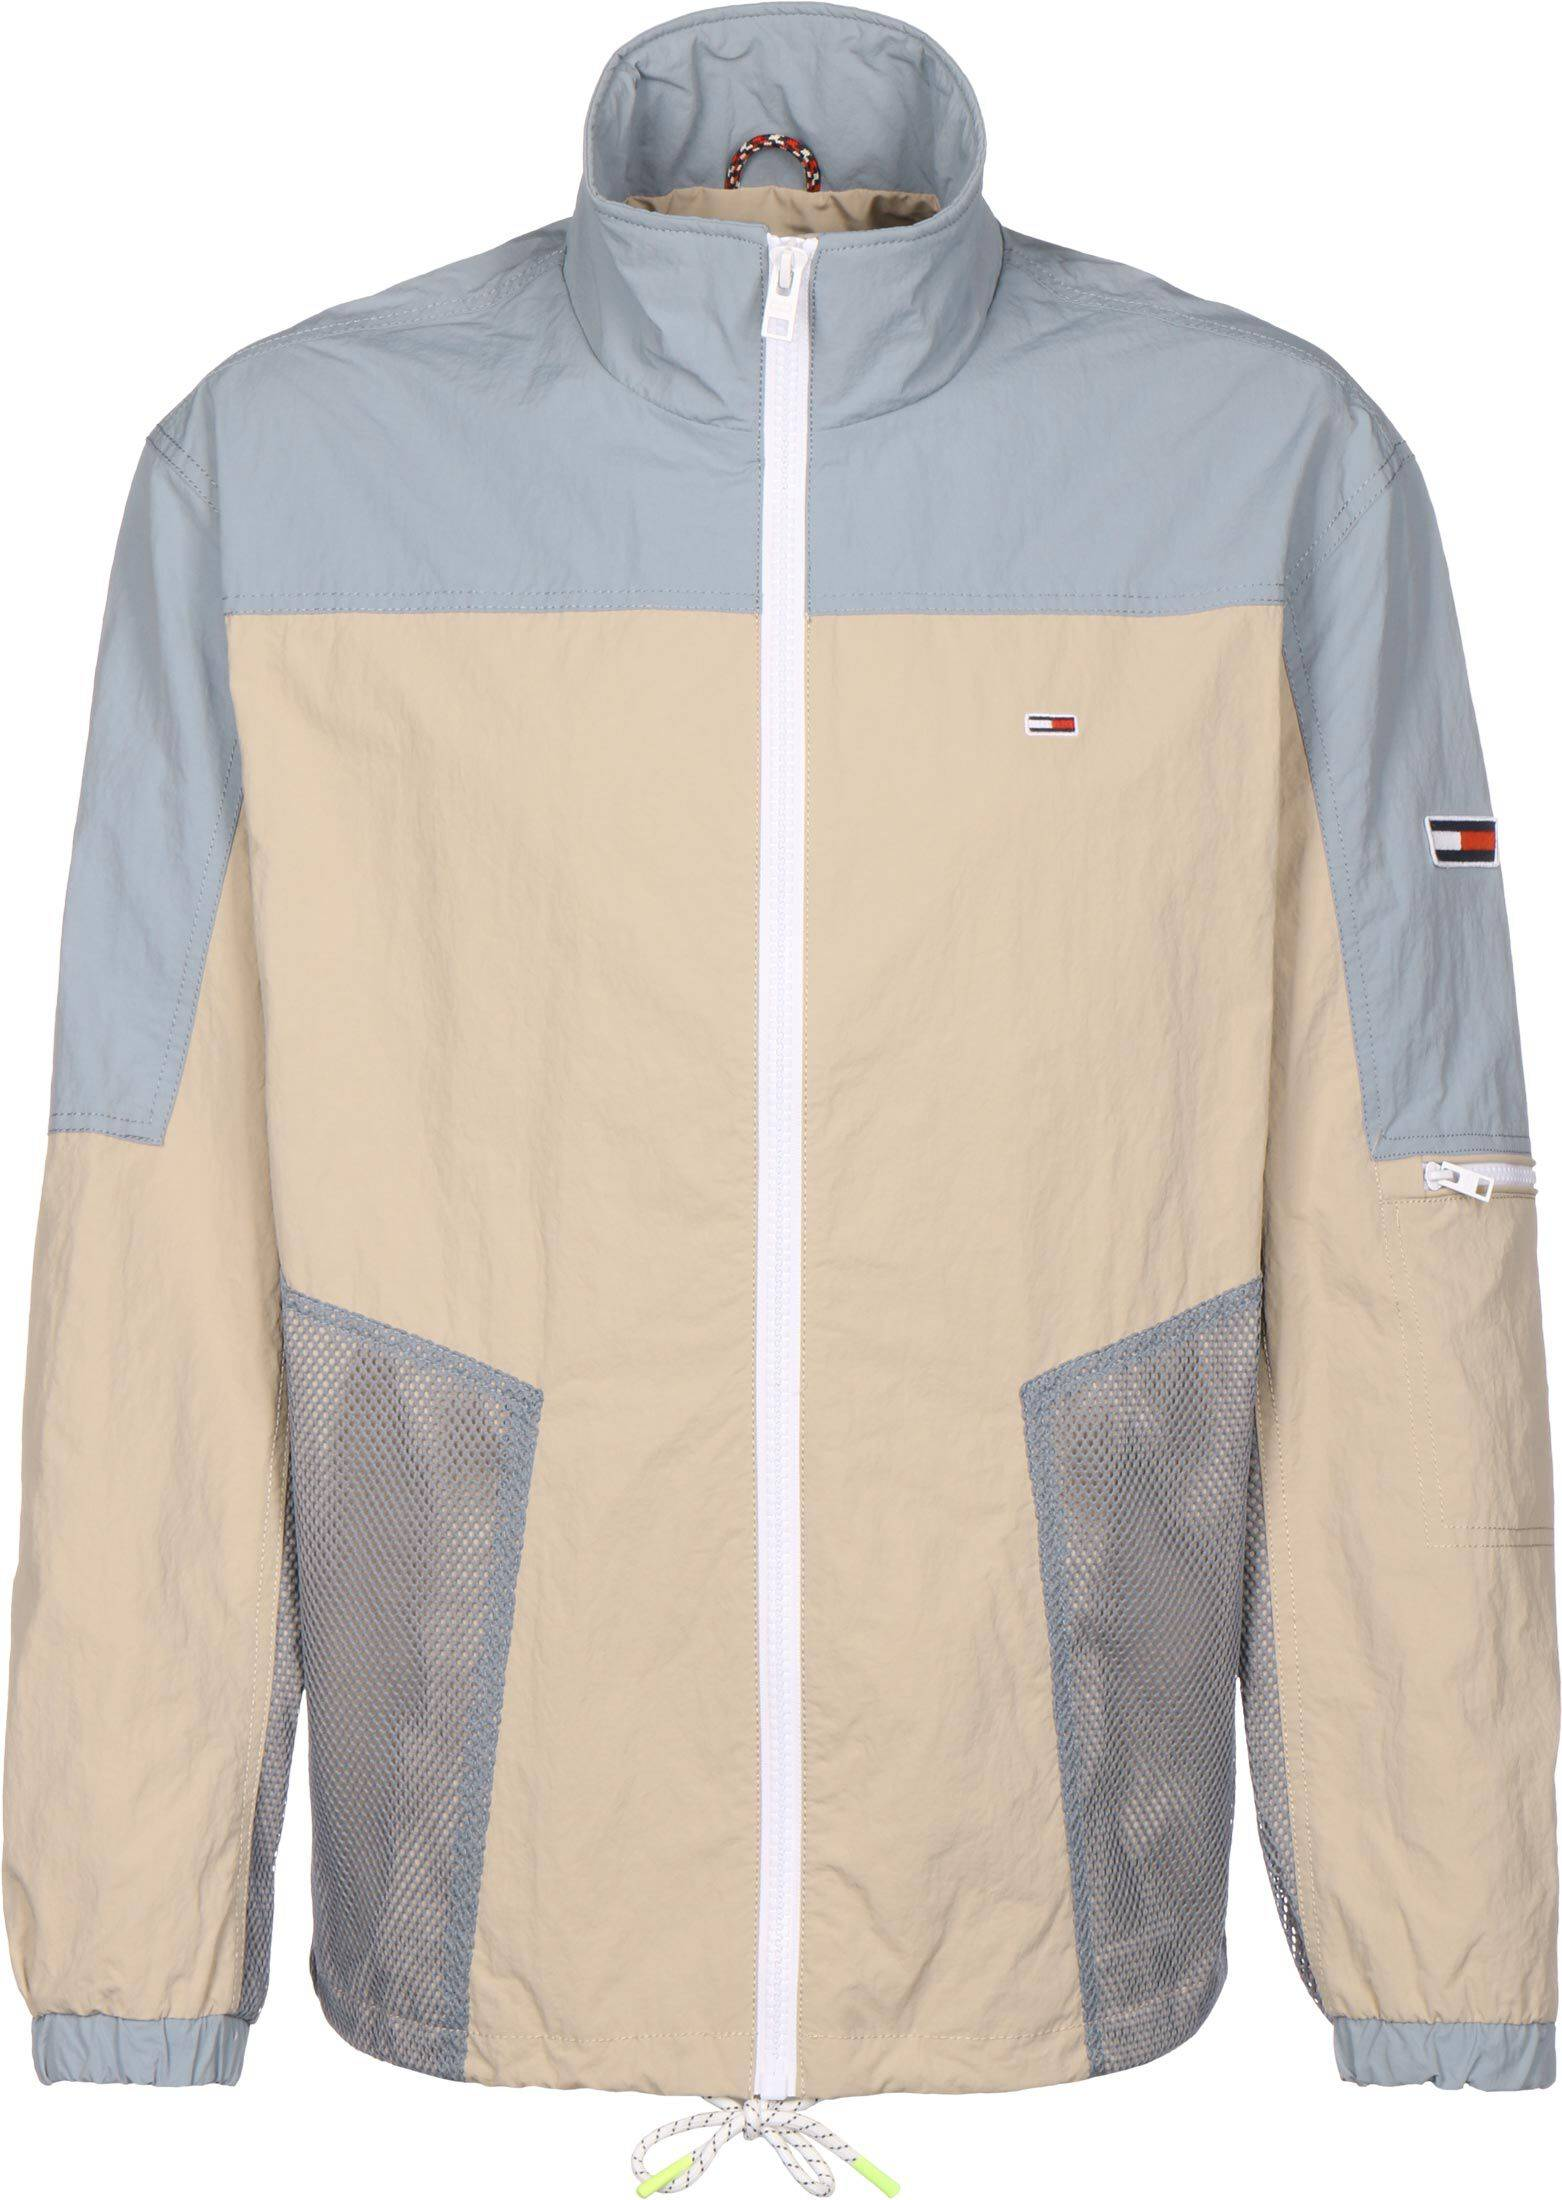 Tommy Jeans Mix Media Colorblock, taille S, homme, beige bleu